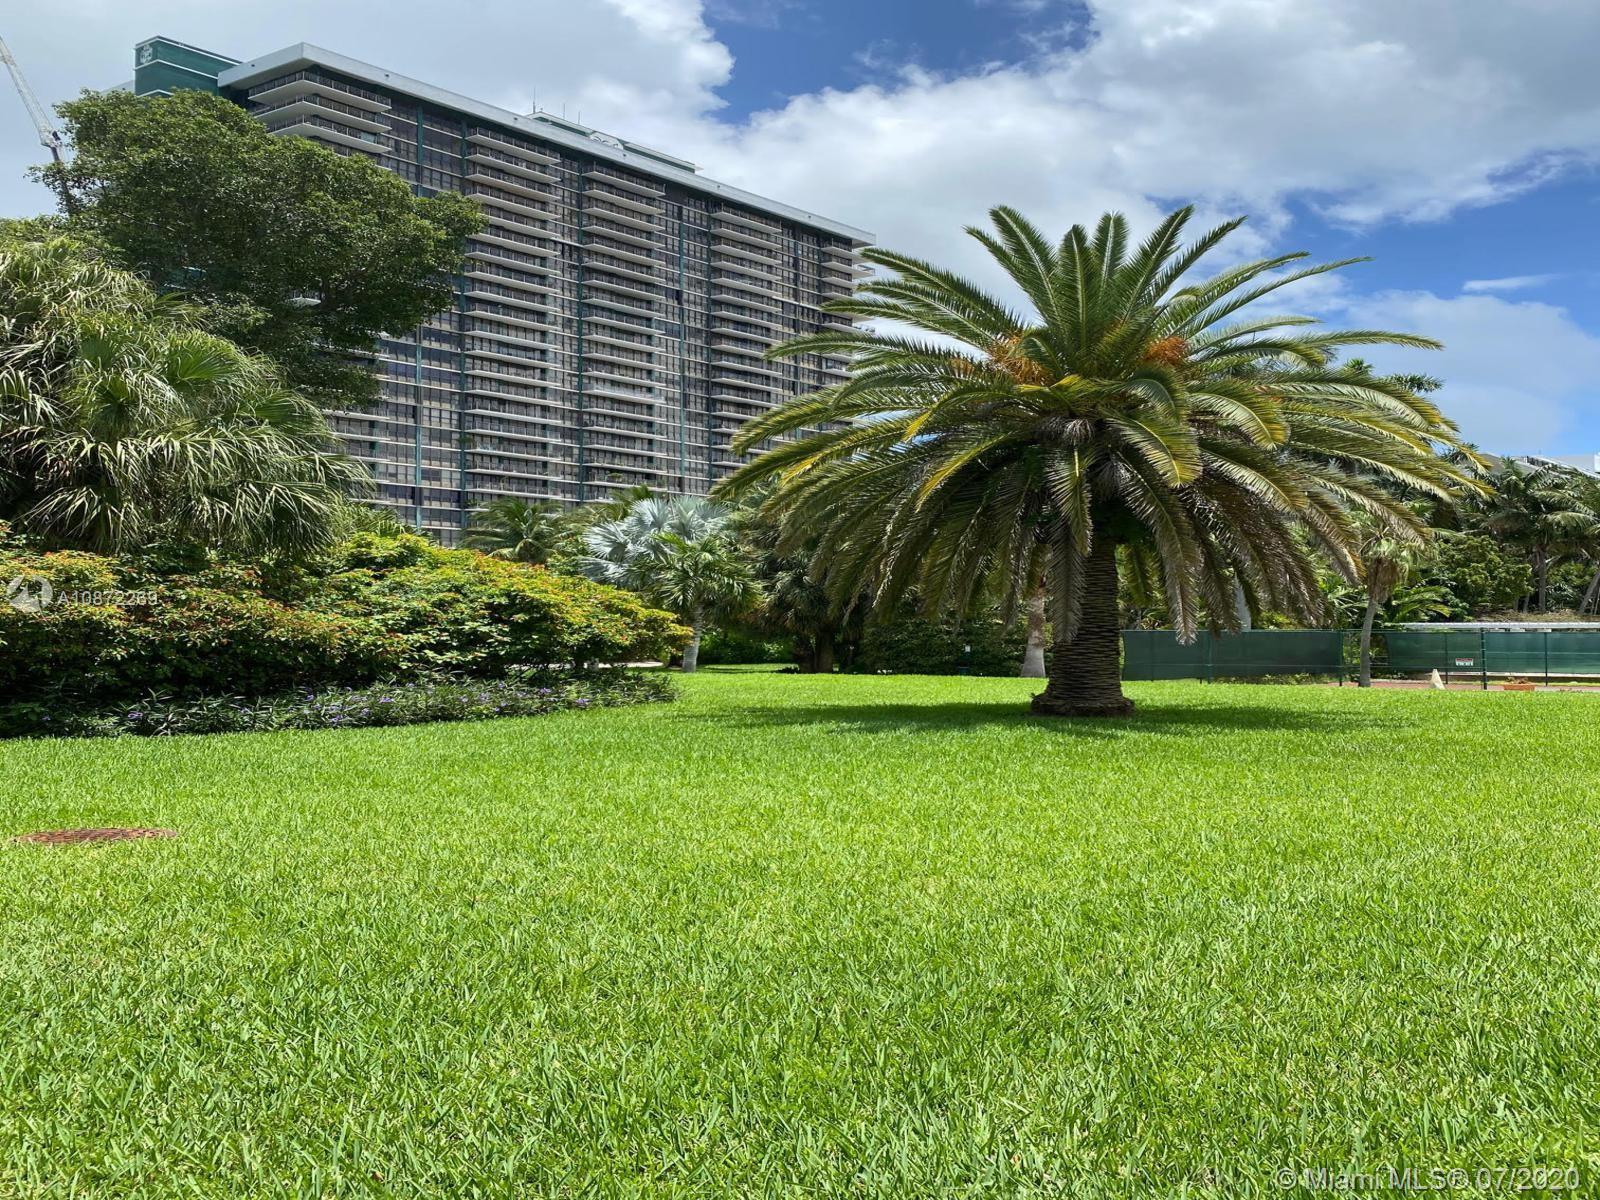 780 NE NE 69th St # 2007, Miami, Florida 33138, 2 Bedrooms Bedrooms, ,2 BathroomsBathrooms,Residential,For Sale,780 NE NE 69th St # 2007,A10872269